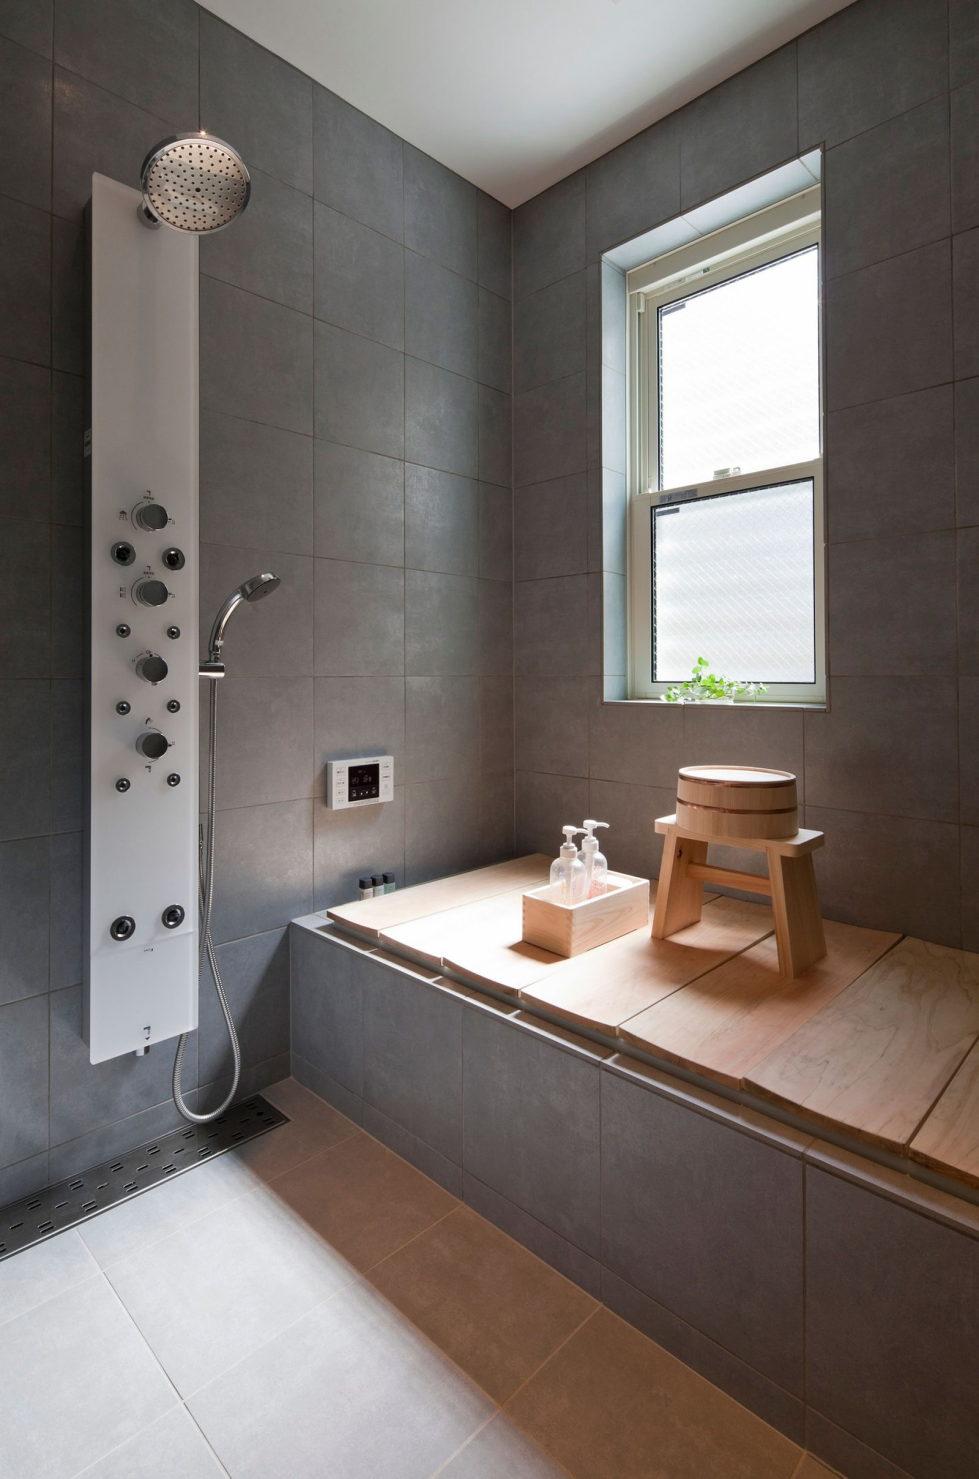 Zen Design House From RCK Design Studio In Japan 24